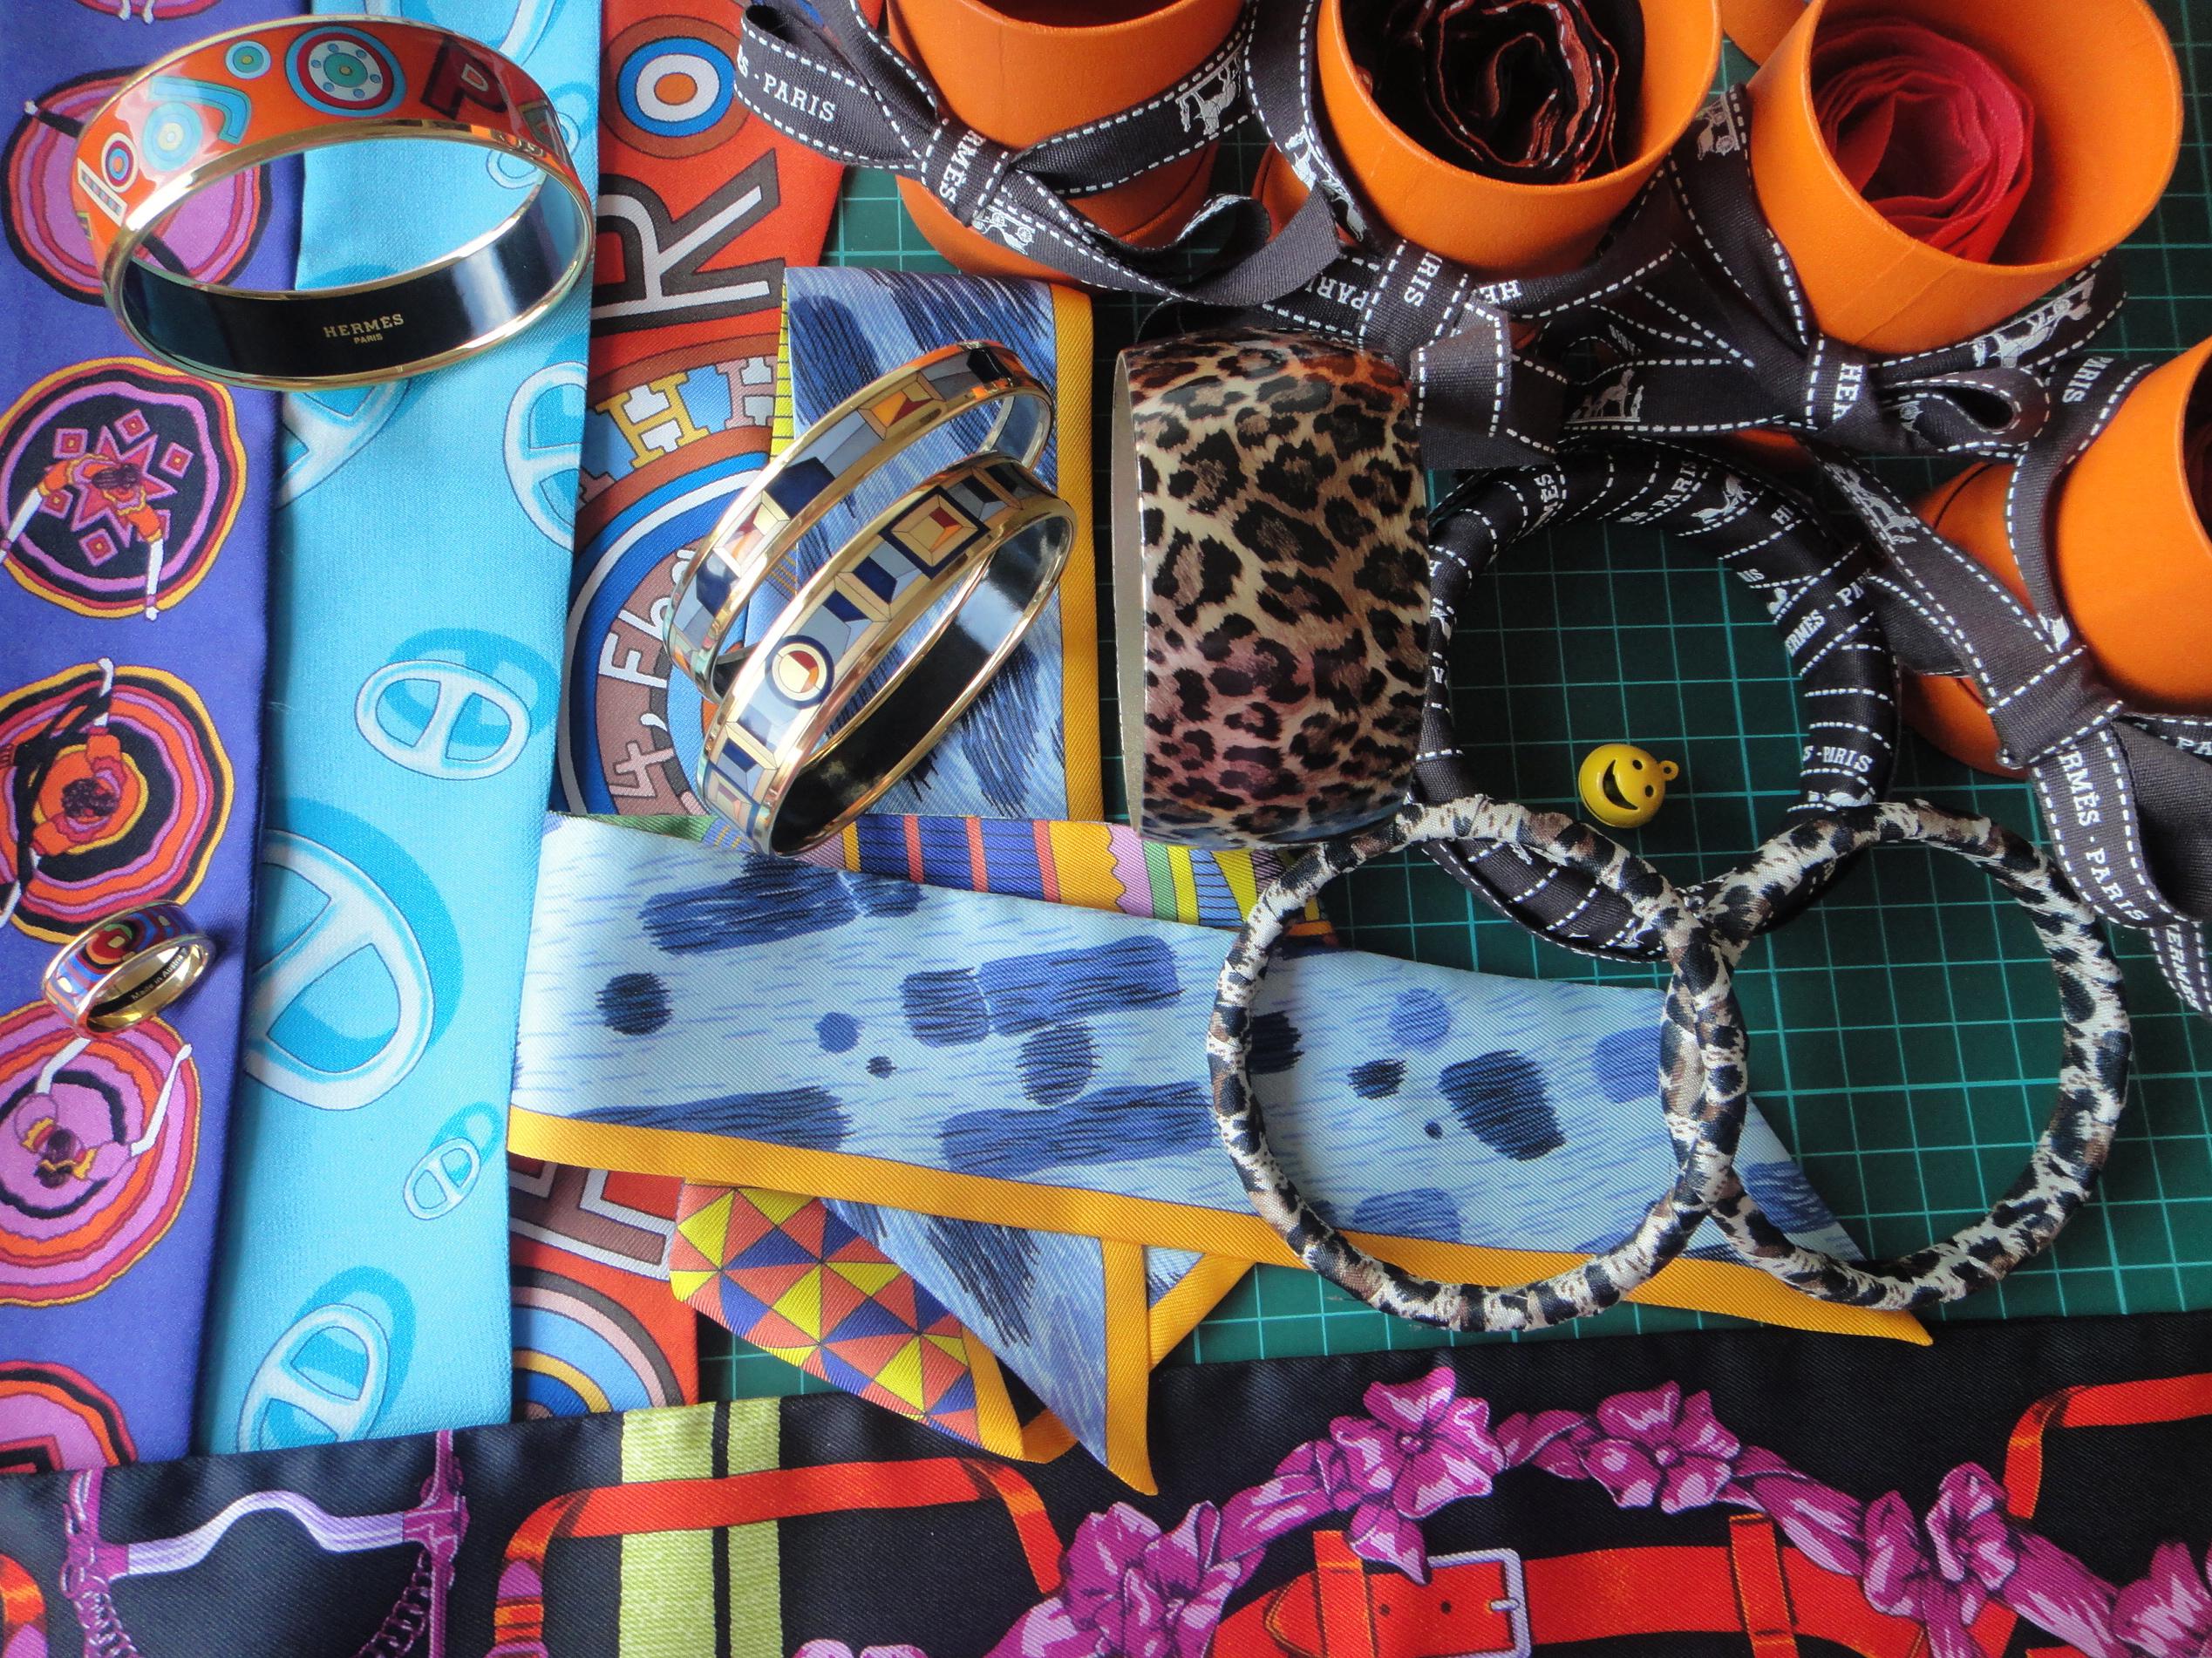 Twillies, ribbons and bangles / Twillys, Schleifen und Armreifen - Hermès, FreyWille